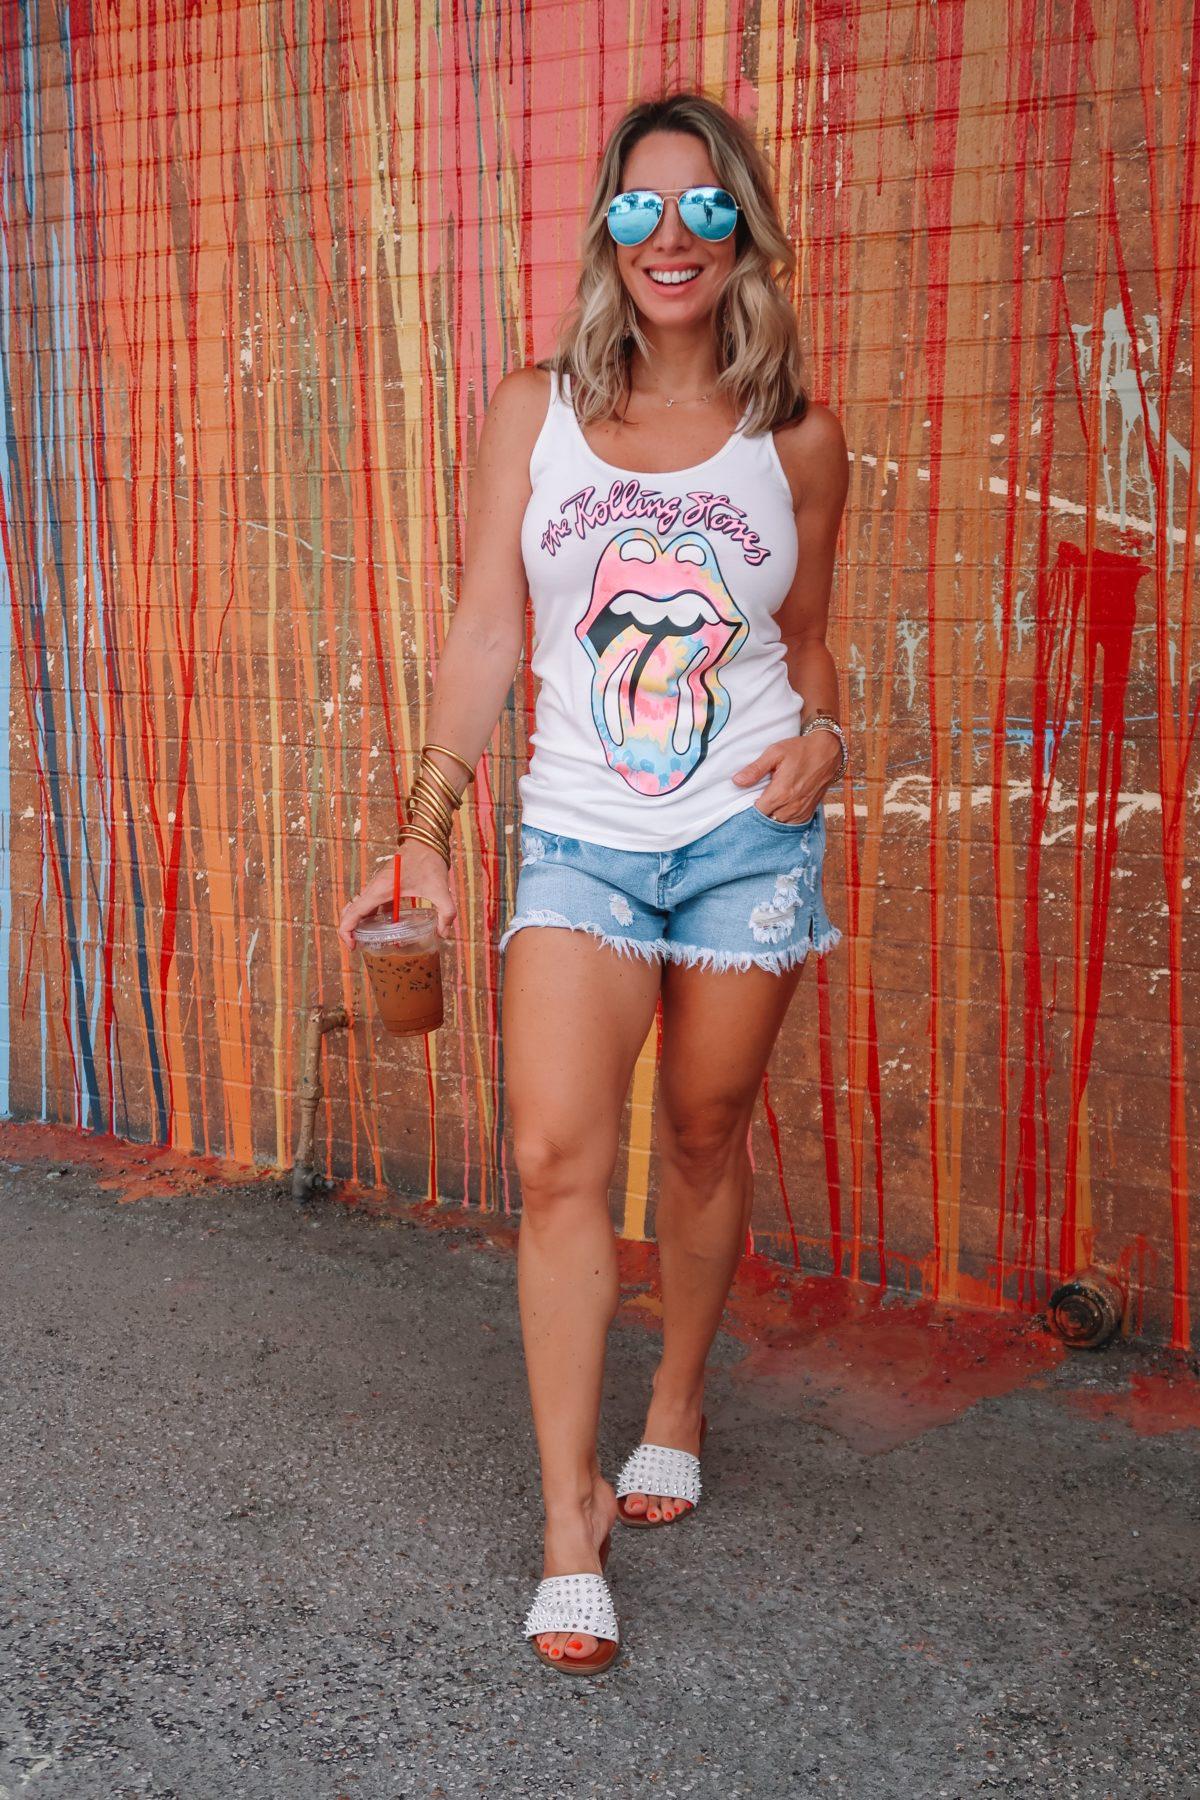 Rolling Stone Tank, Denim Shorts, Studded Slides, Sunglasses